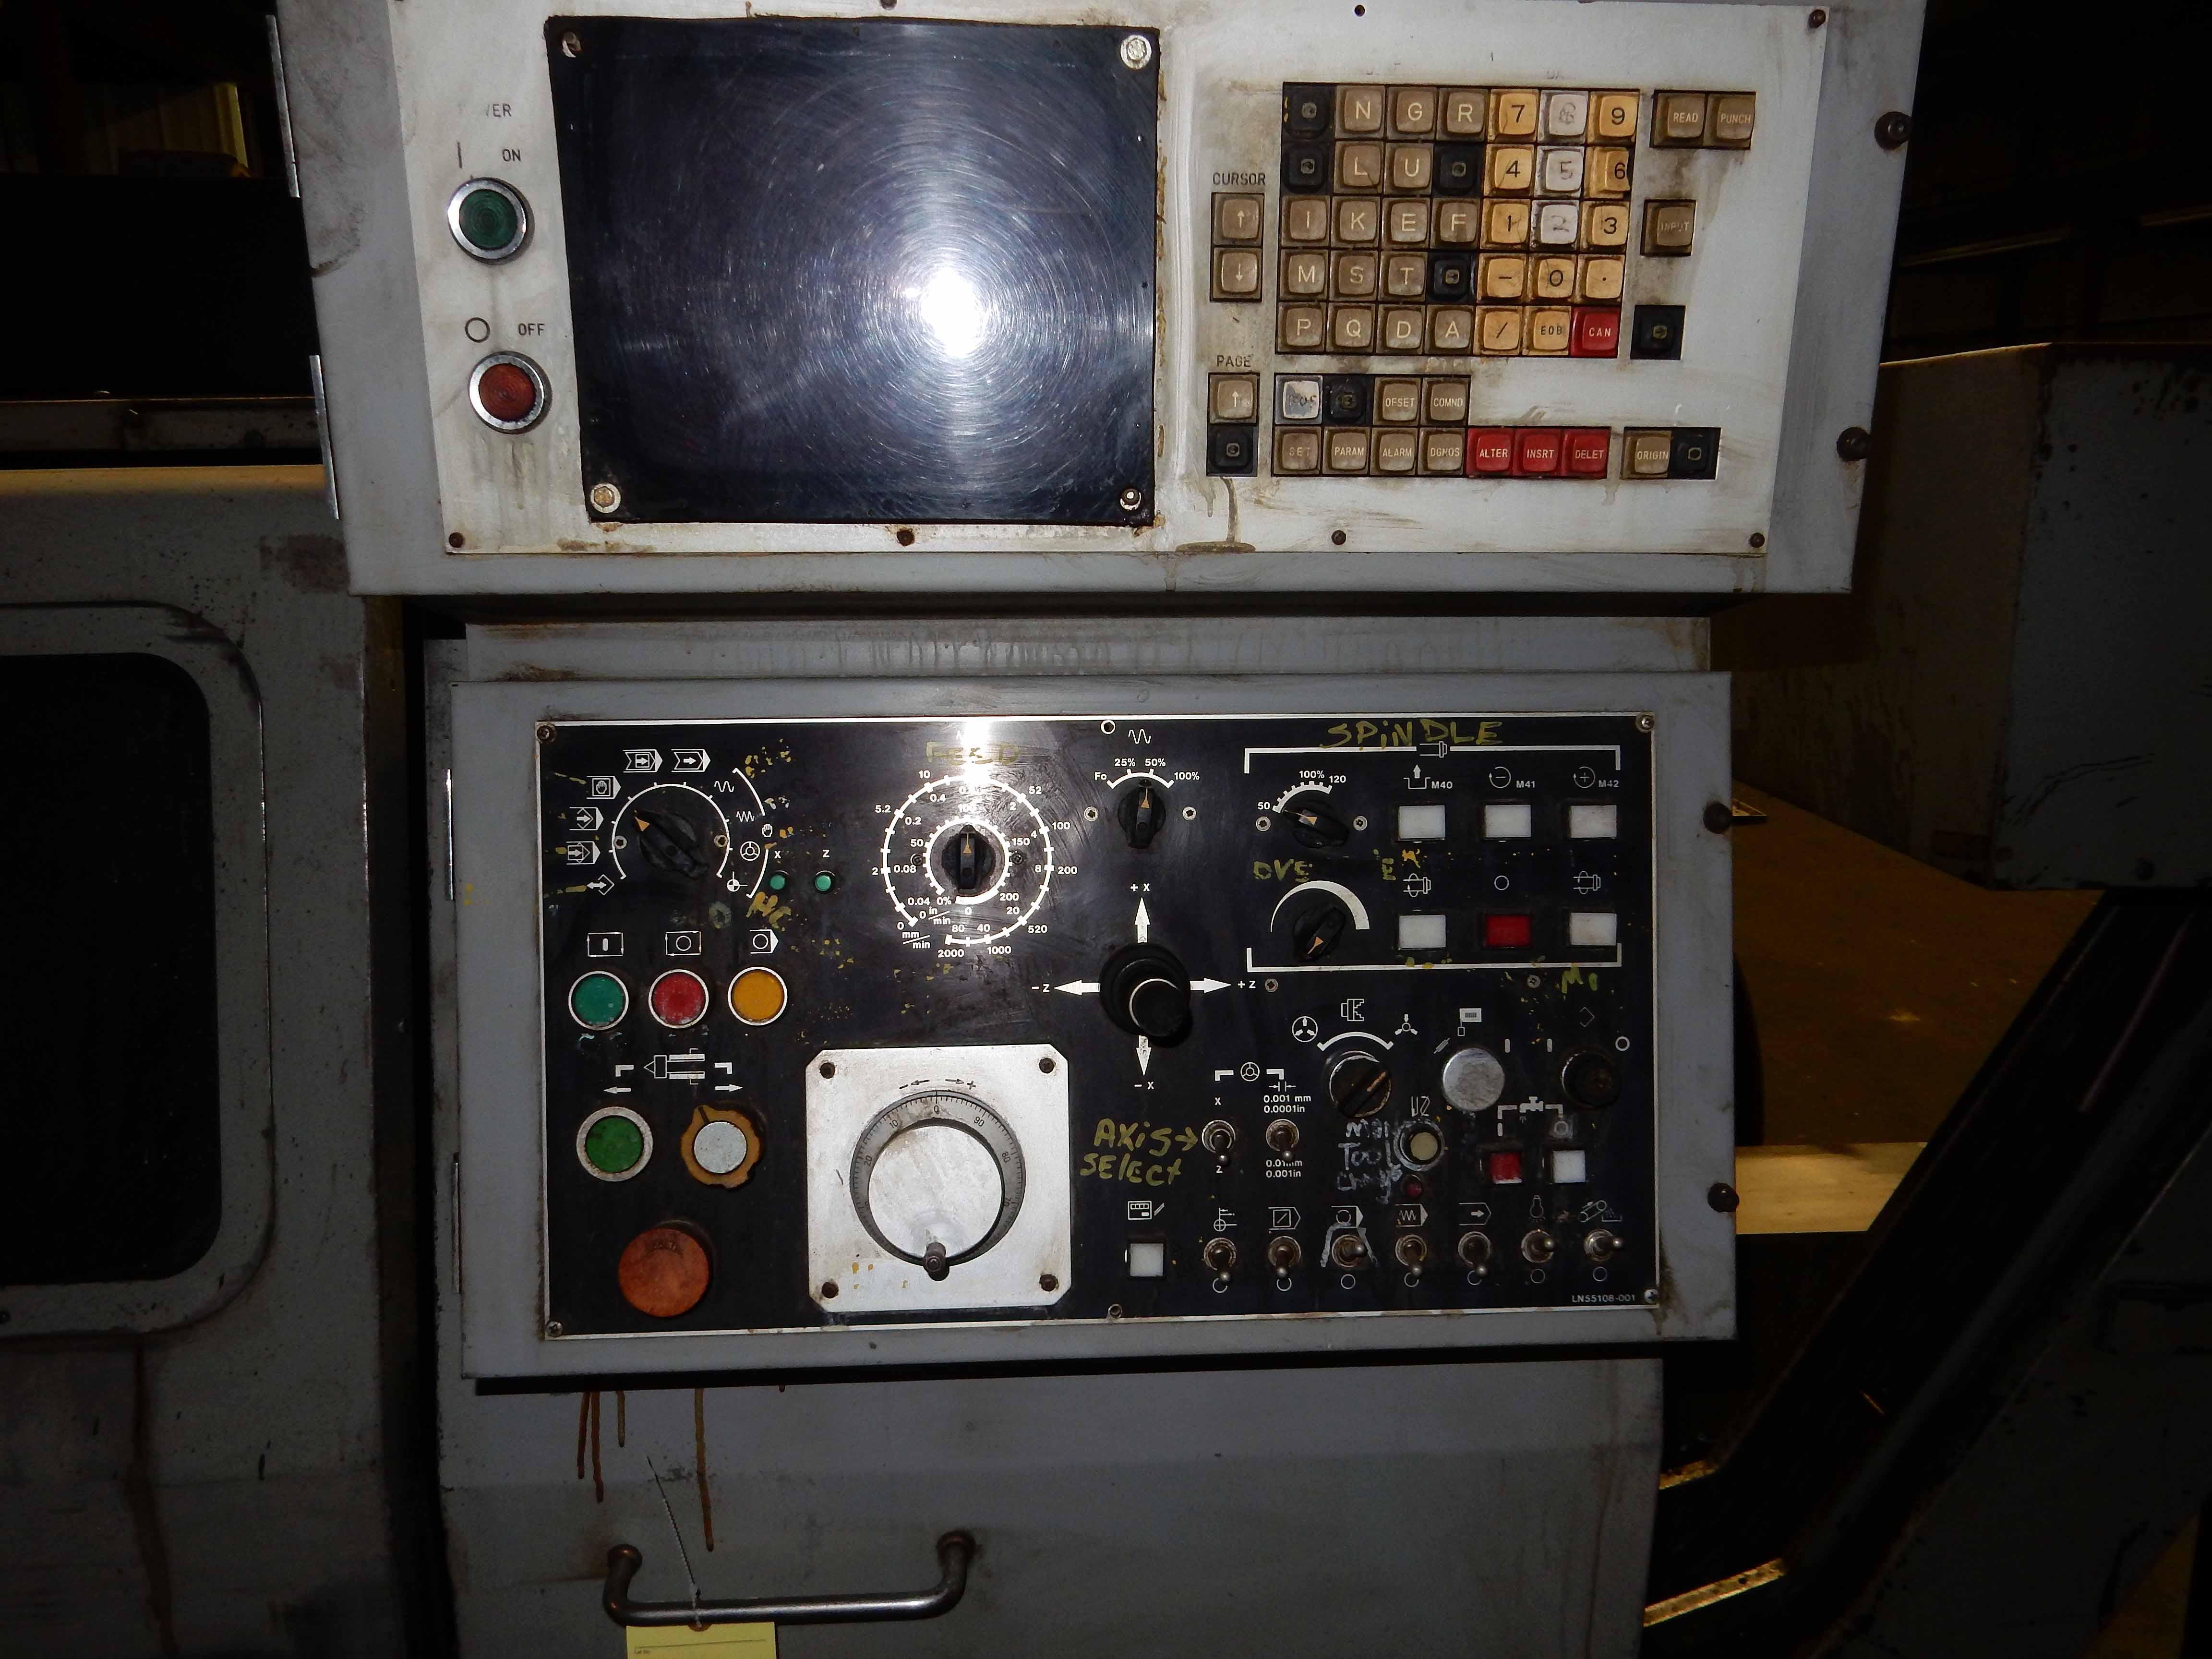 "Lot 44 - CNC LATHE, TAKISAWA MDL. DTX-3, 15"" dia. 3-jaw chuck, 8 pos. turret, Machine No. TLNN0226 (currently"